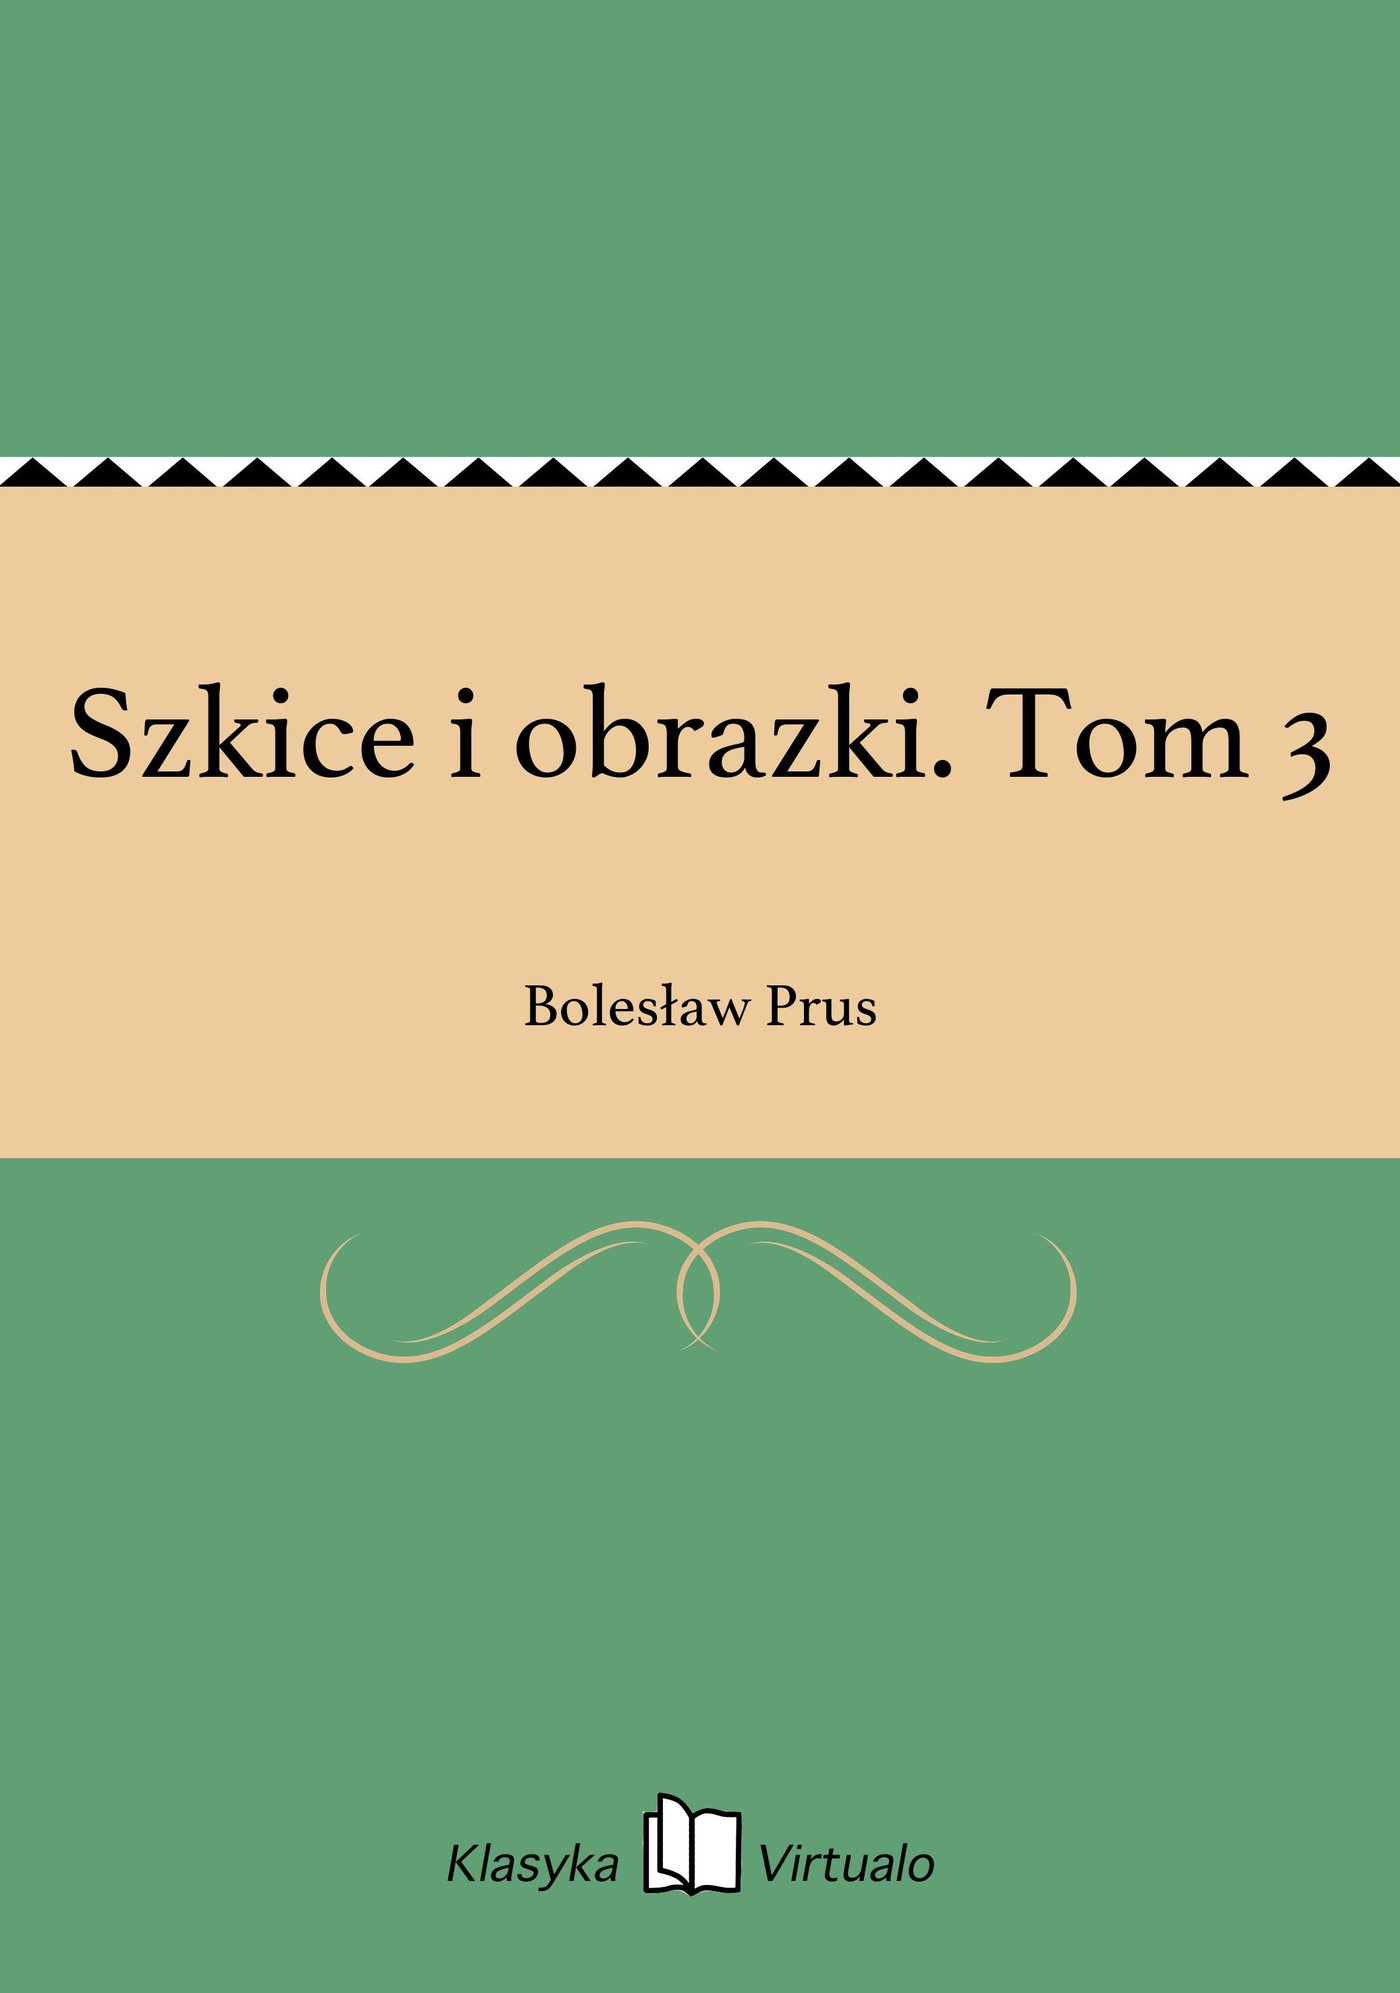 Szkice i obrazki. Tom 3 - Ebook (Książka na Kindle) do pobrania w formacie MOBI